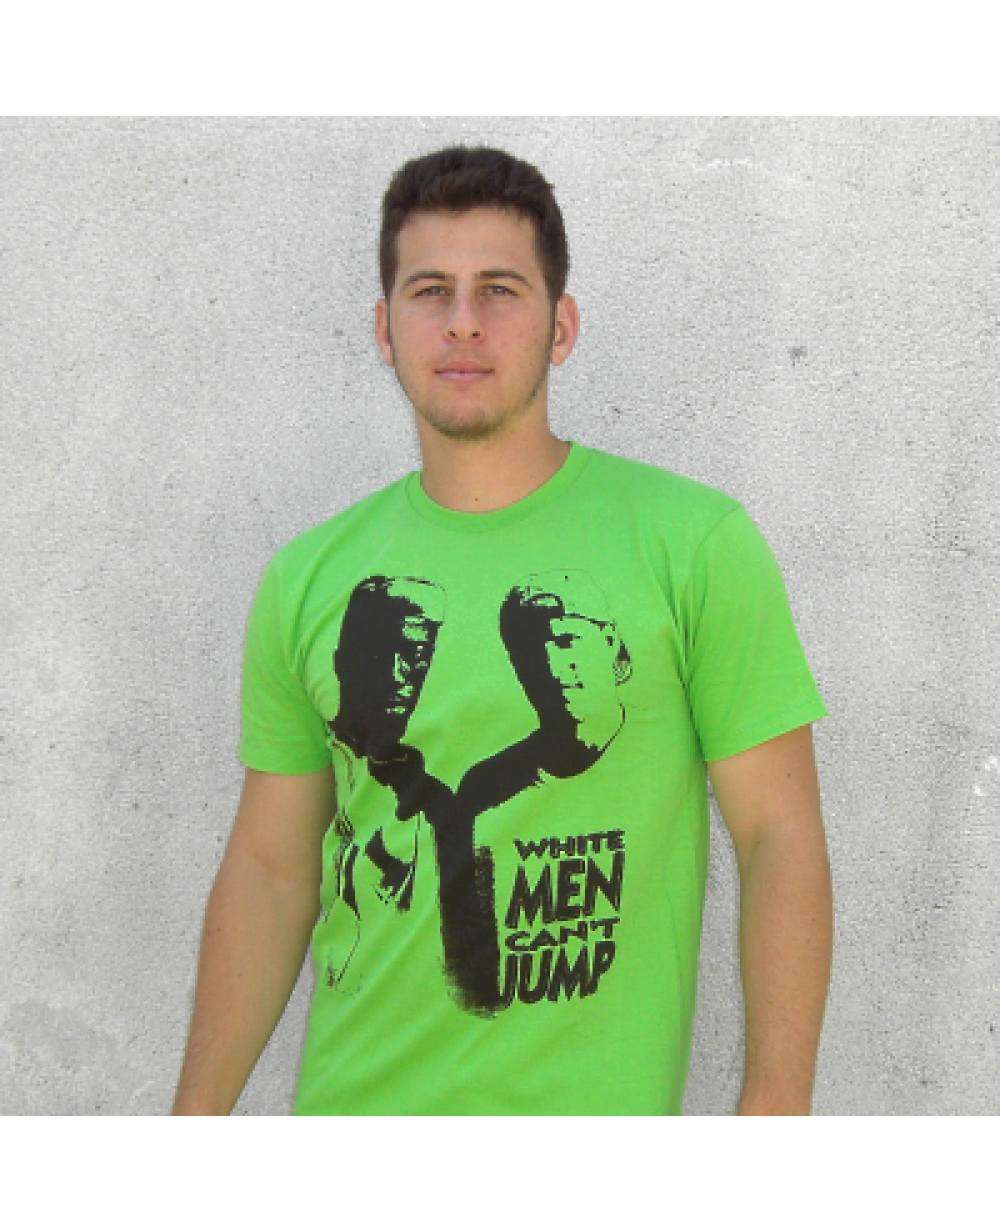 White Men Cant Jump T Shirt